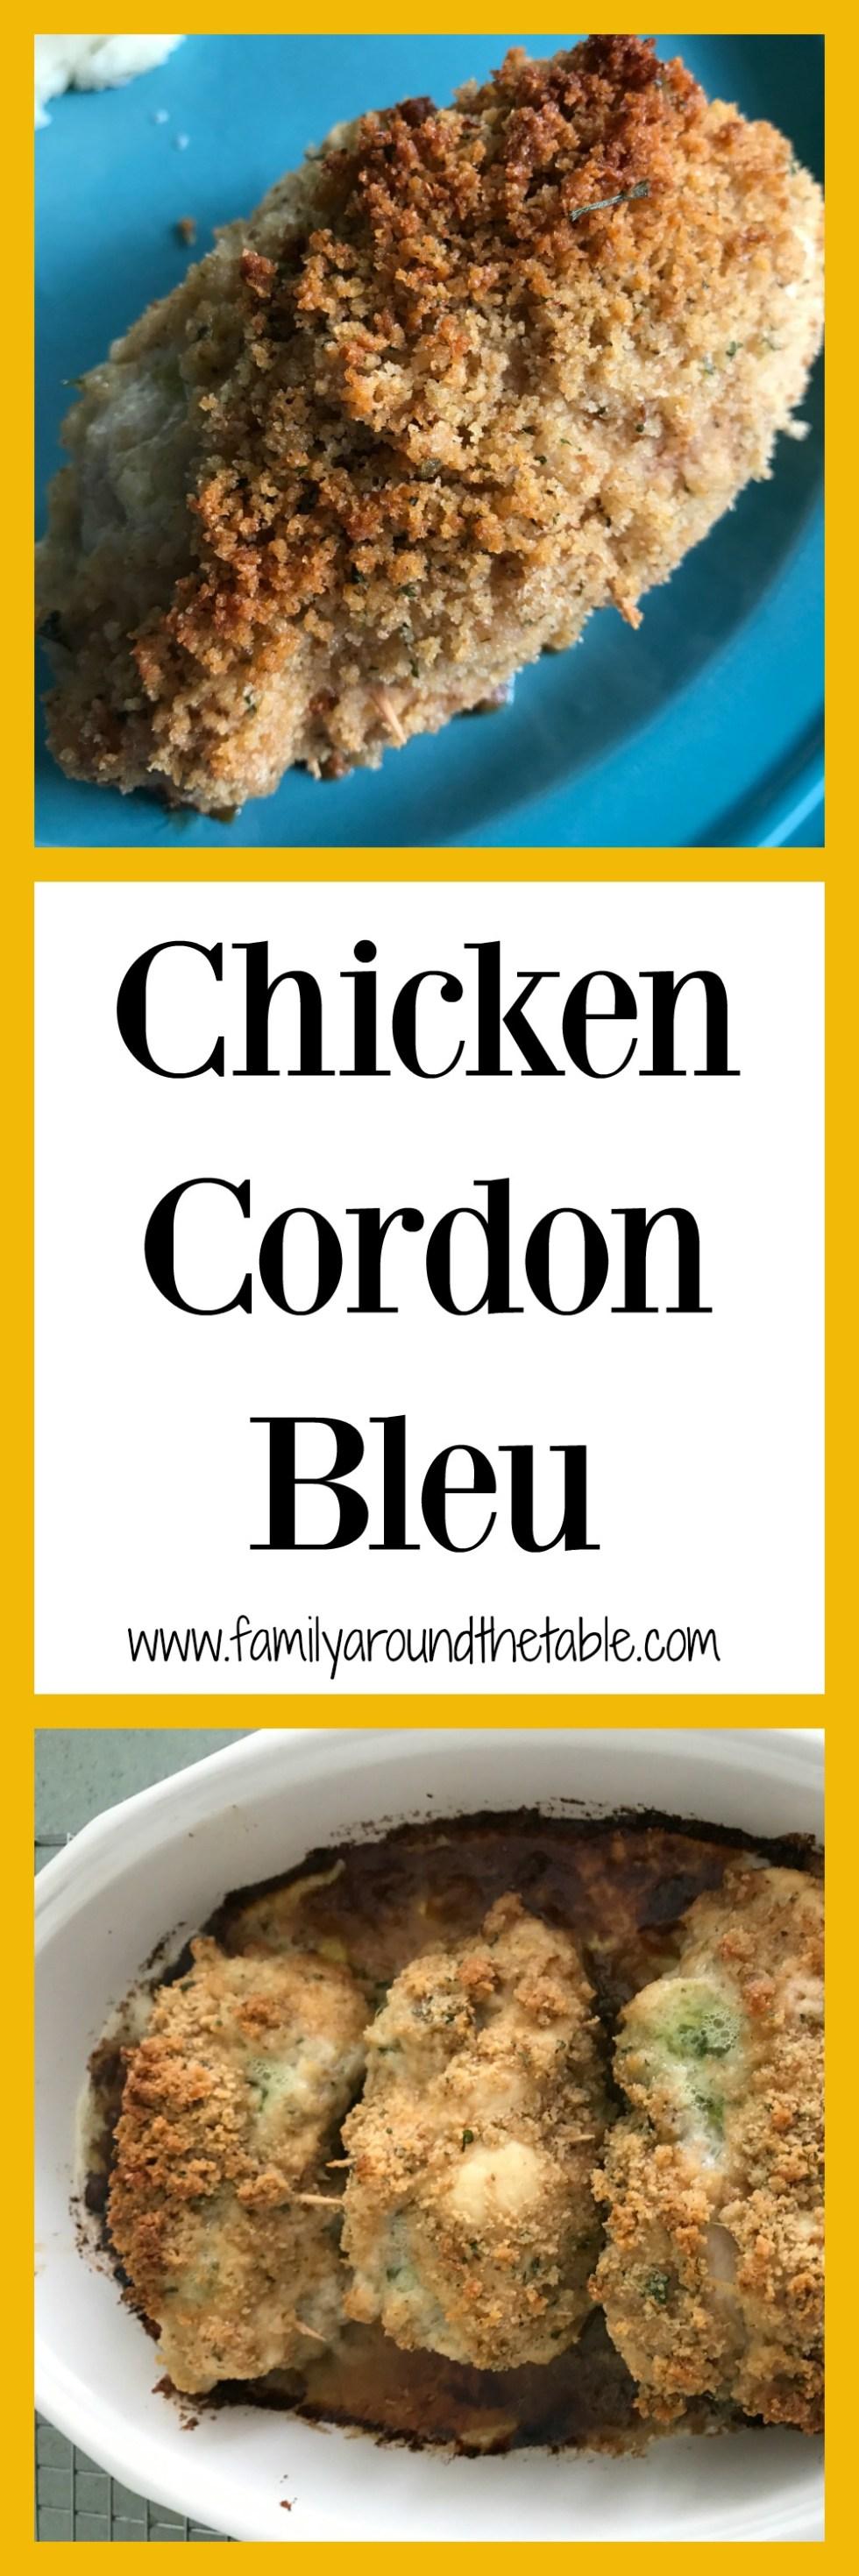 Chicken Cordon Bleu is an impressive dish for company.